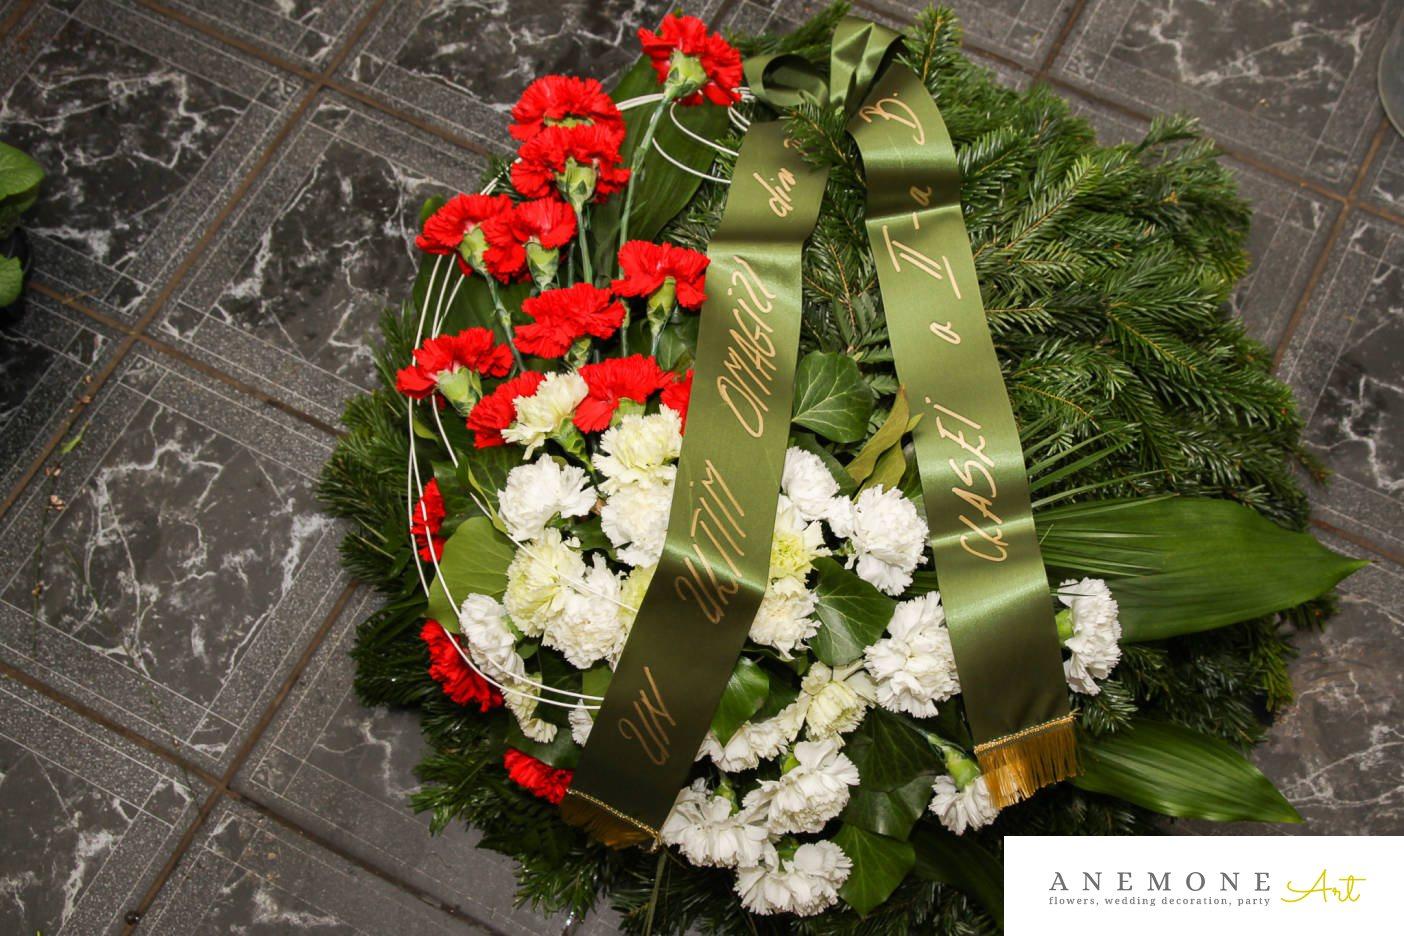 Poza, foto cu Flori de nunta alb, coroana funerara, garoafe, rosu, rotund in Arad, Timisoara, Oradea (wedding flowers, bouquets) nunta Arad, Timisoara, Oradea